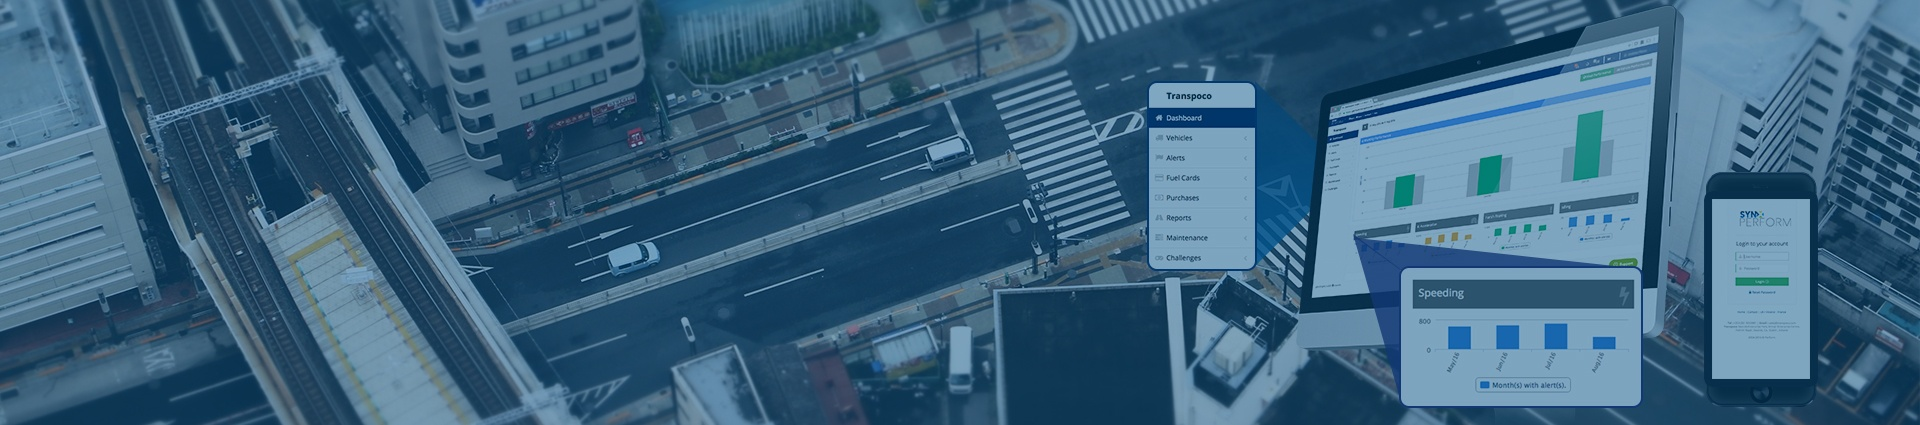 Transpoco | Fleet Management | Vehicle Tracking Solution